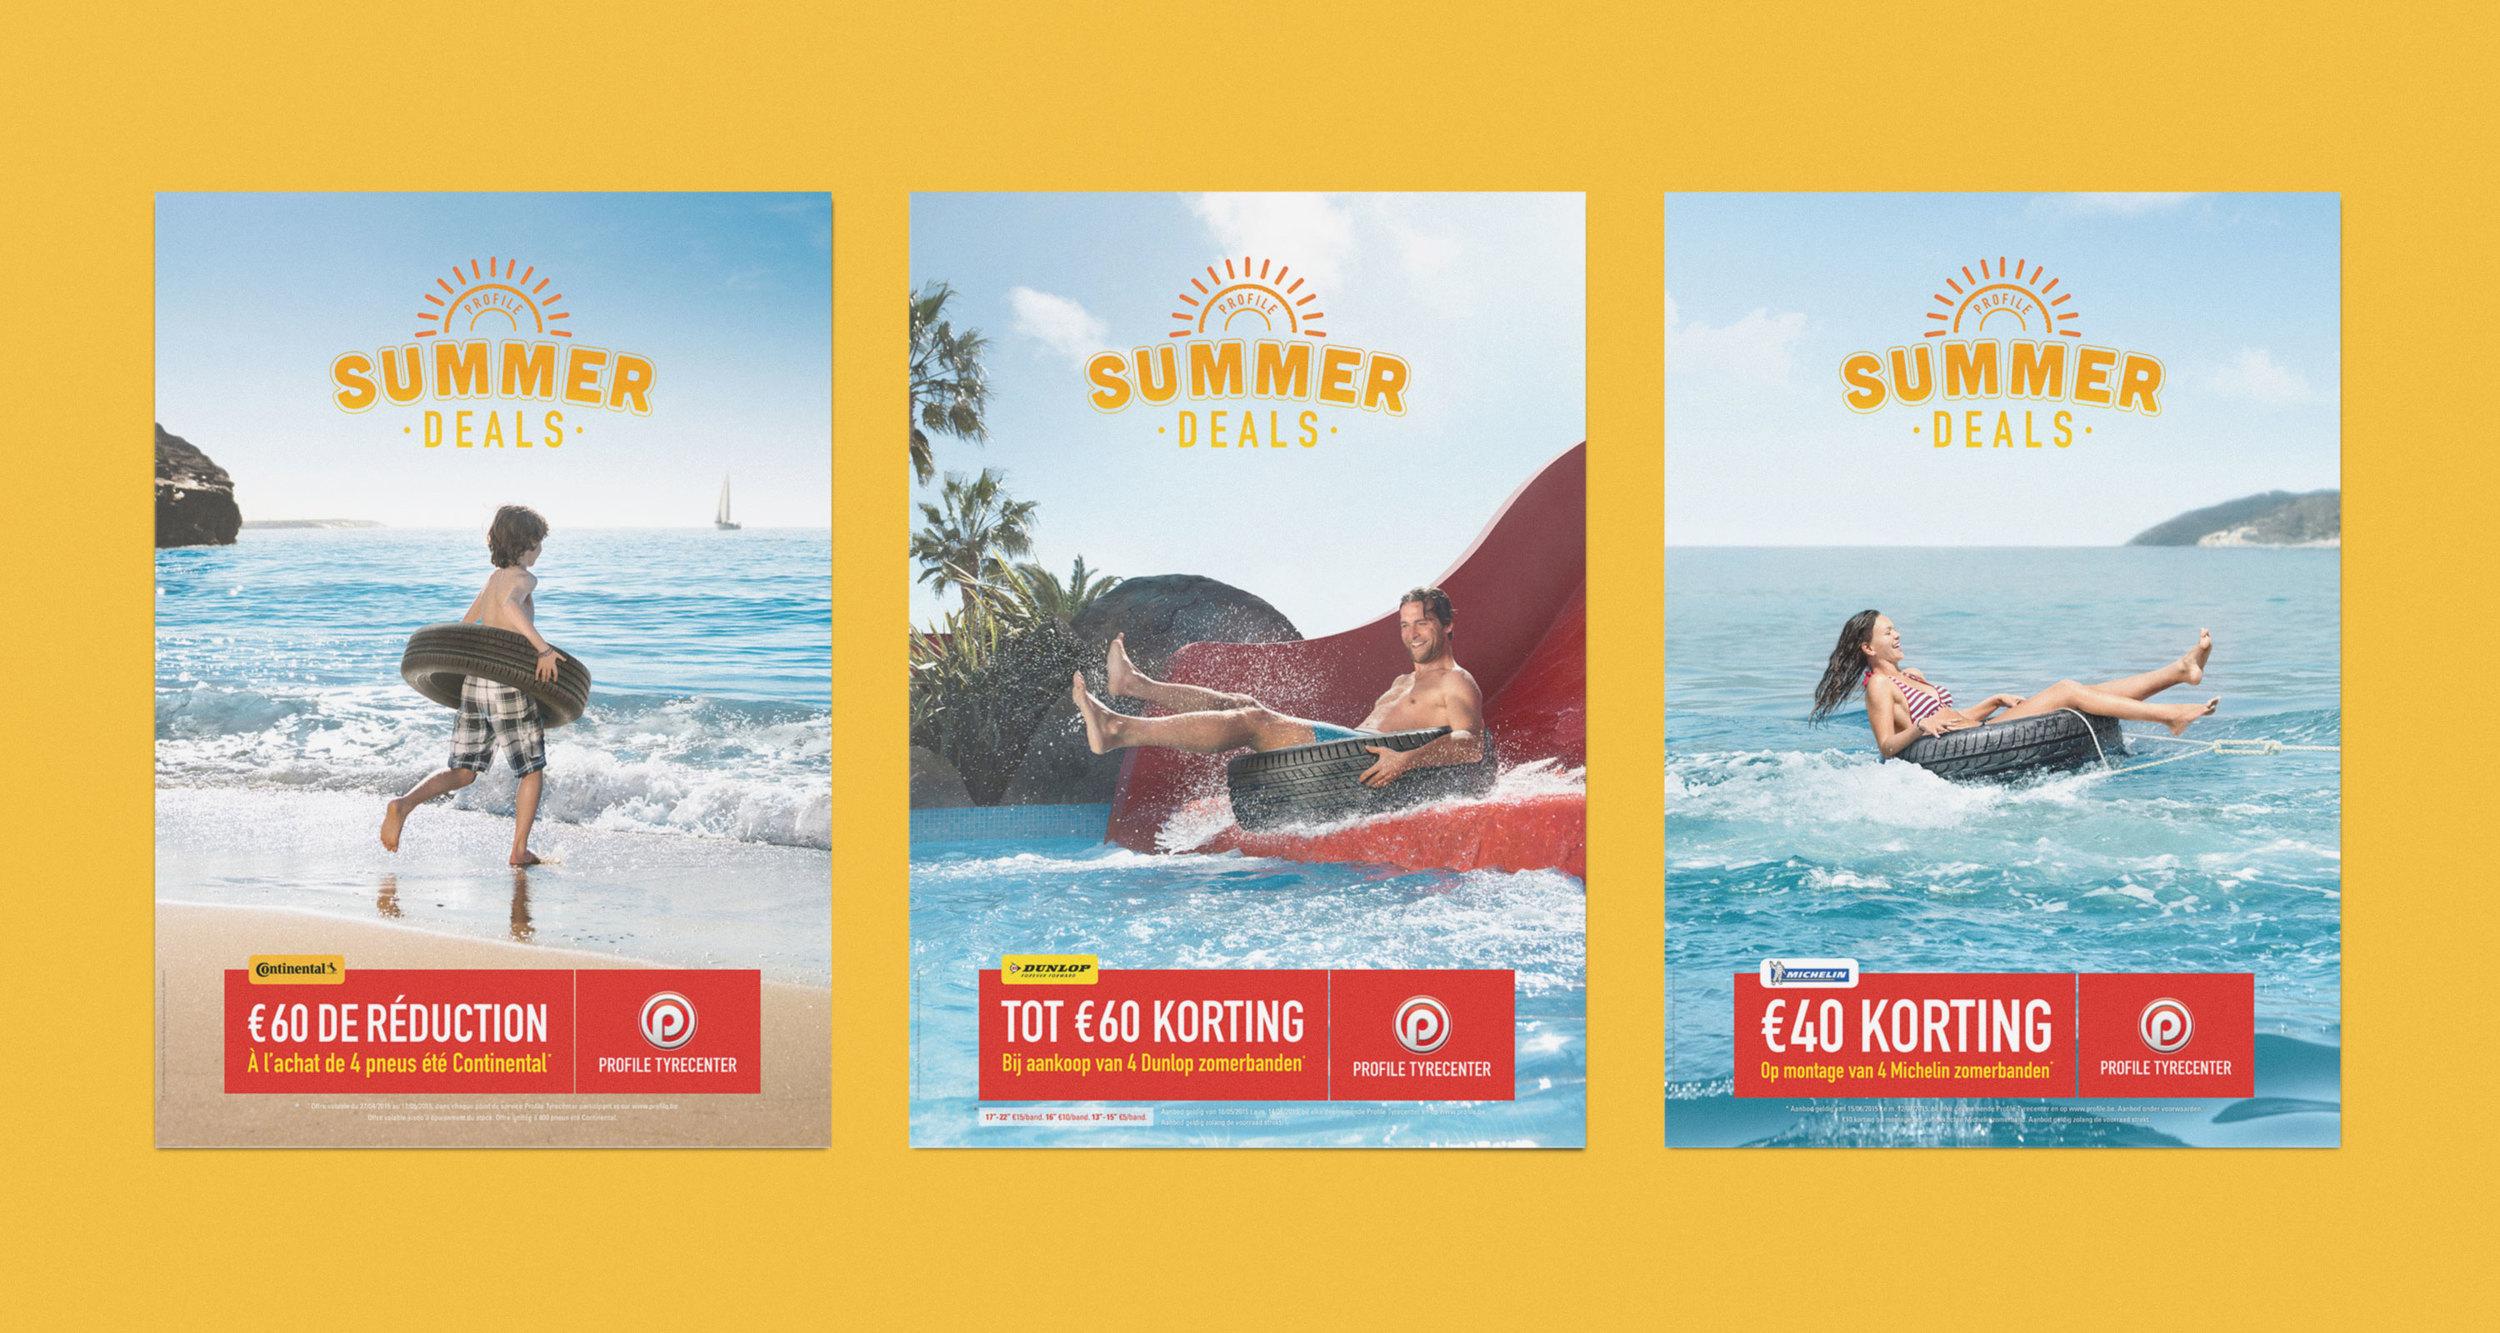 Profile Tyrecenter Summer Deals posters